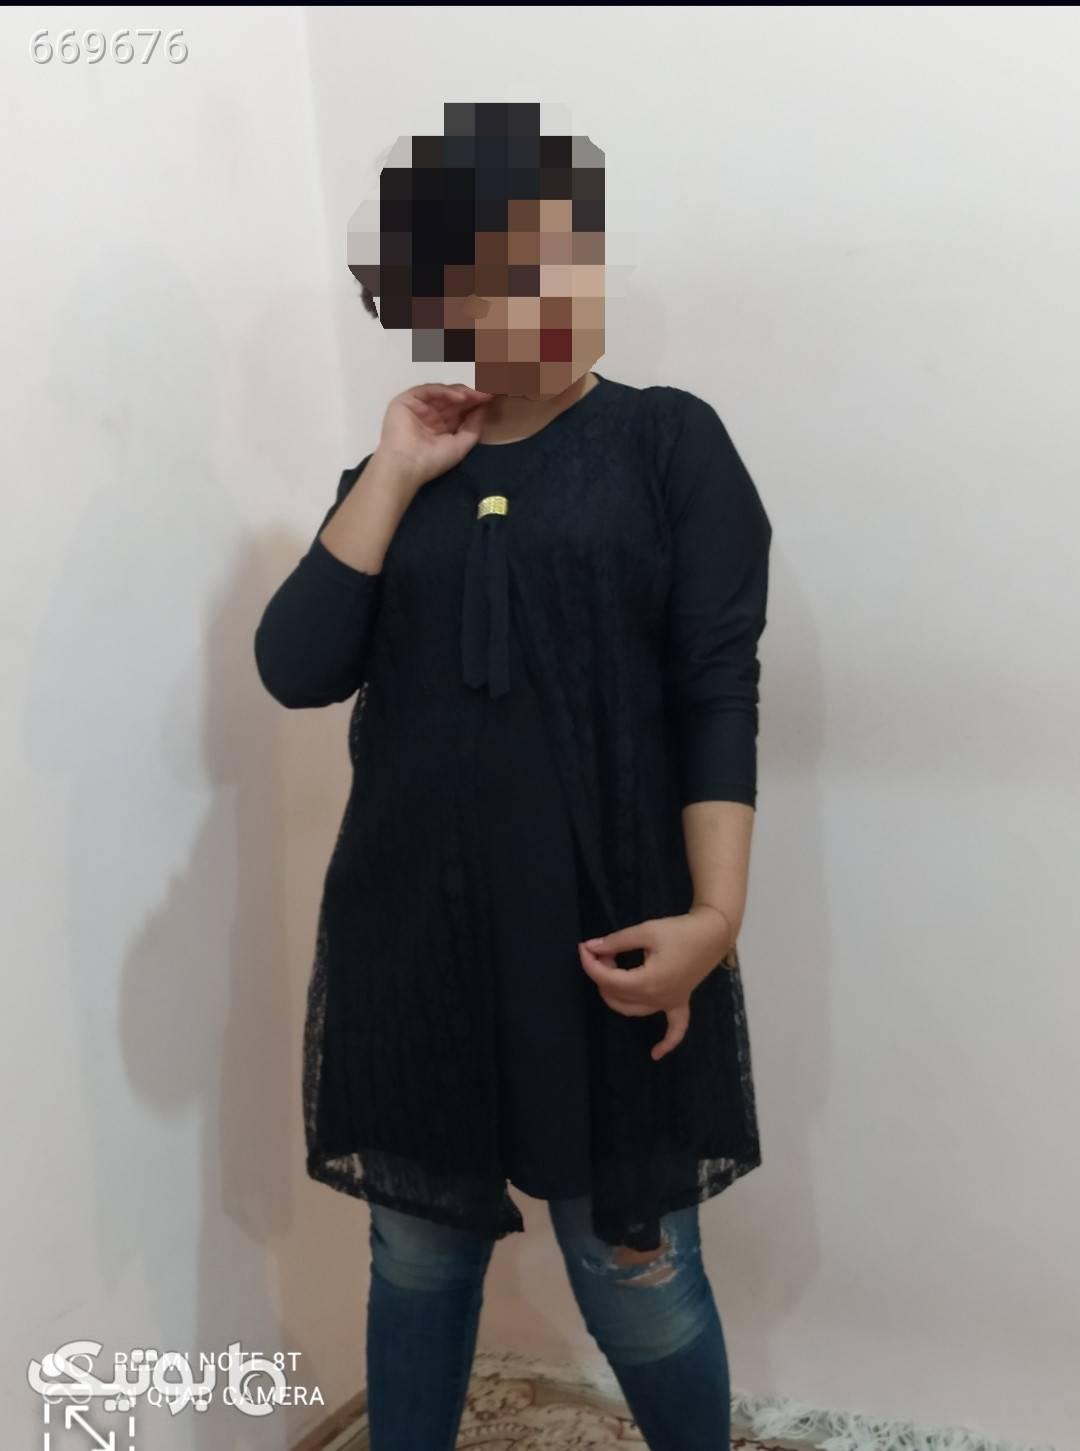 شومیزمجلسی قواره دارققق مشکی لباس  مجلسی